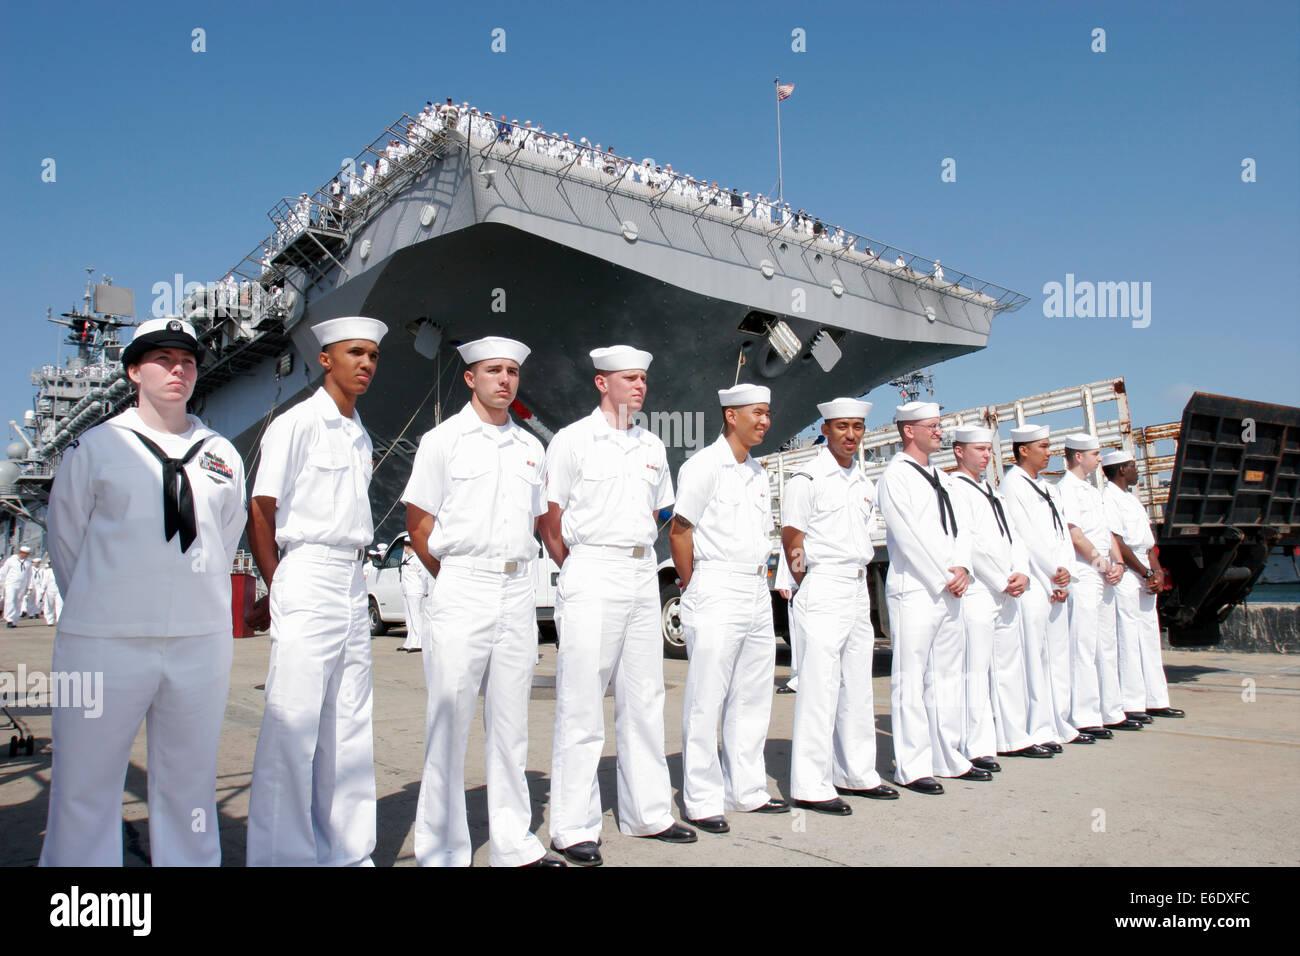 Sailors and Marines Reunite With Their Families, San Diego Naval Base, California, USA. Stock Photo